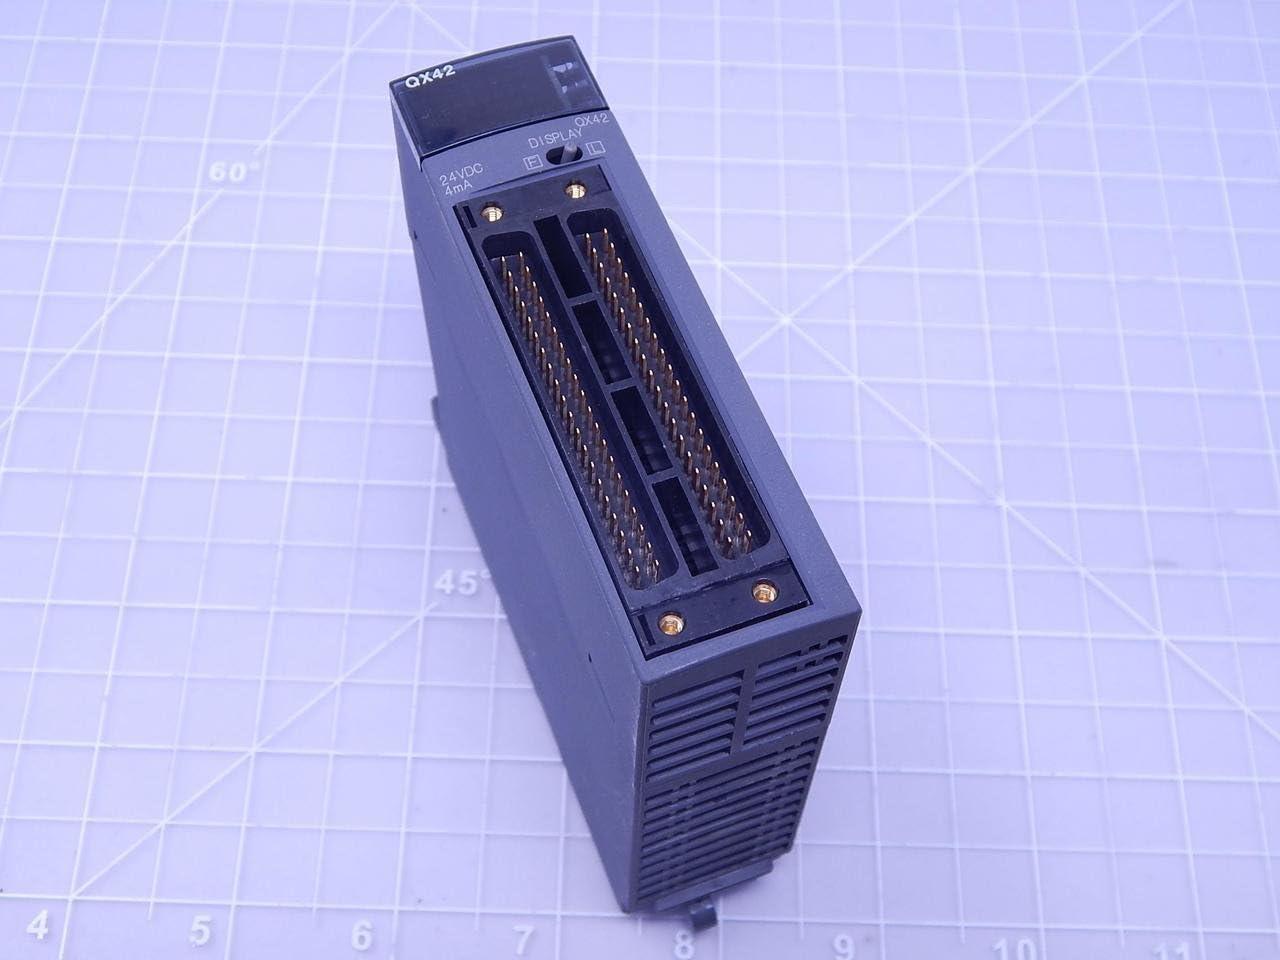 64 Points DC Positive Common MITSUBISHI ELECTRIC QX82 Input Modules NN Source